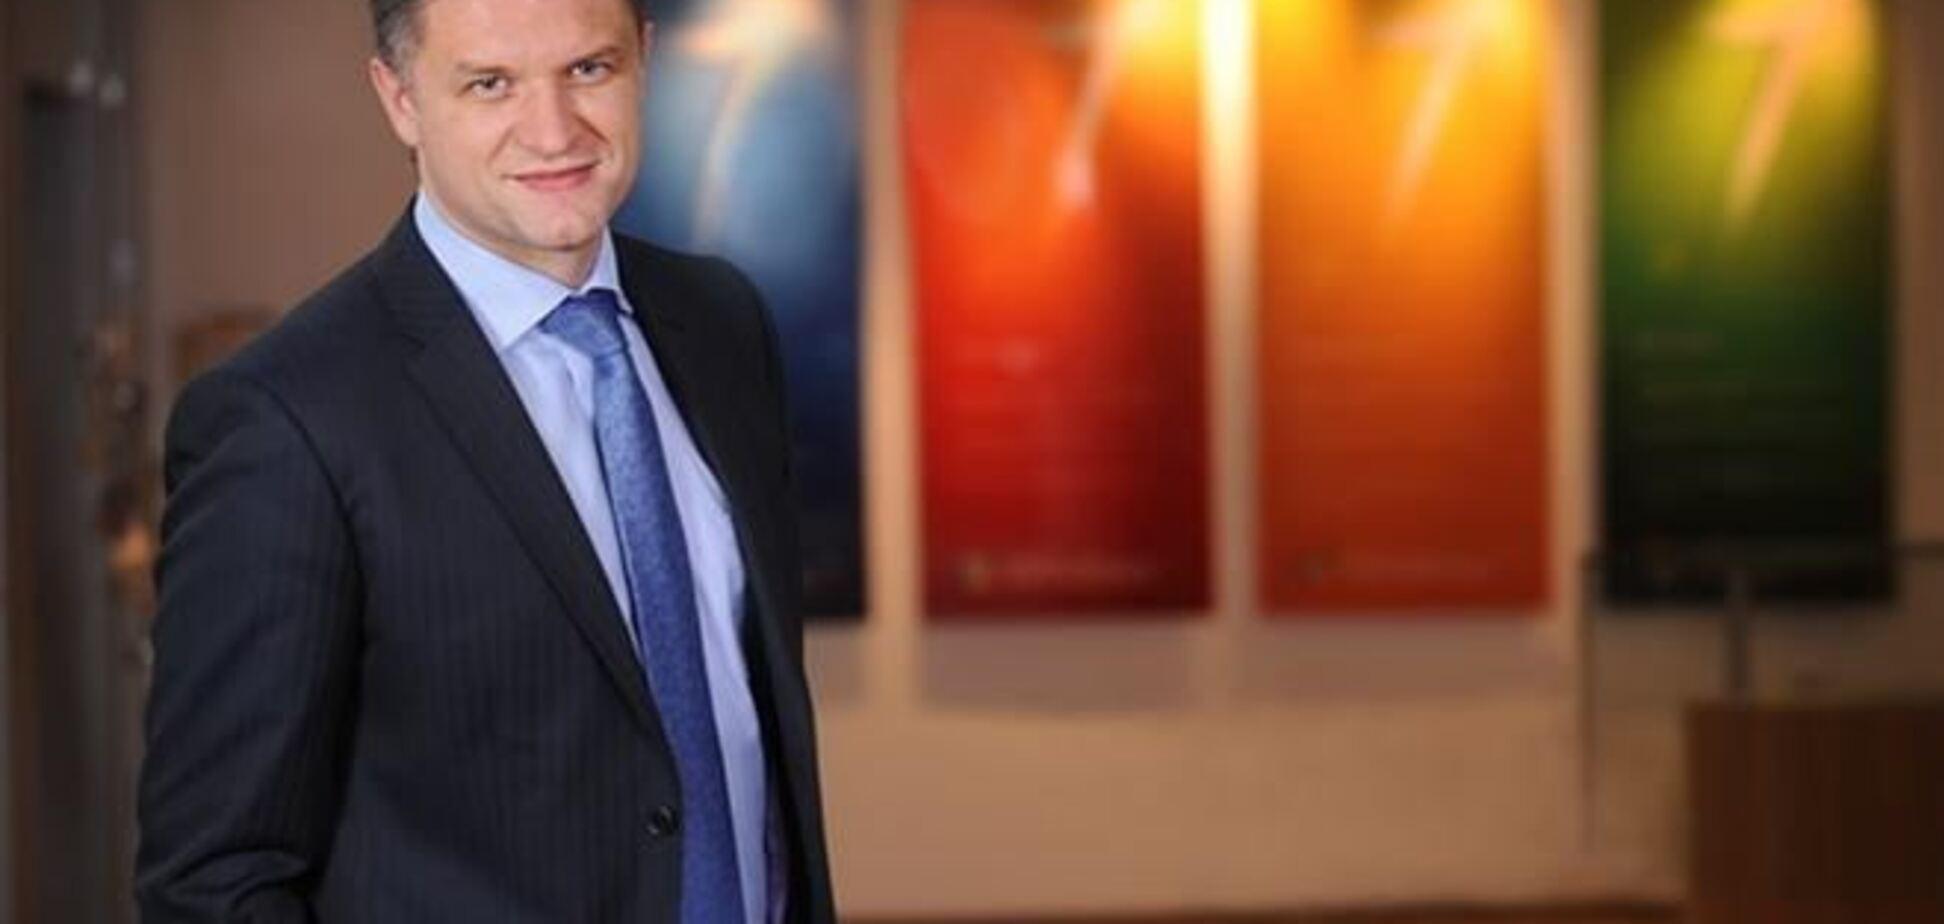 Гендиректор Microsoft Украина строит баррикады на Евромайдане